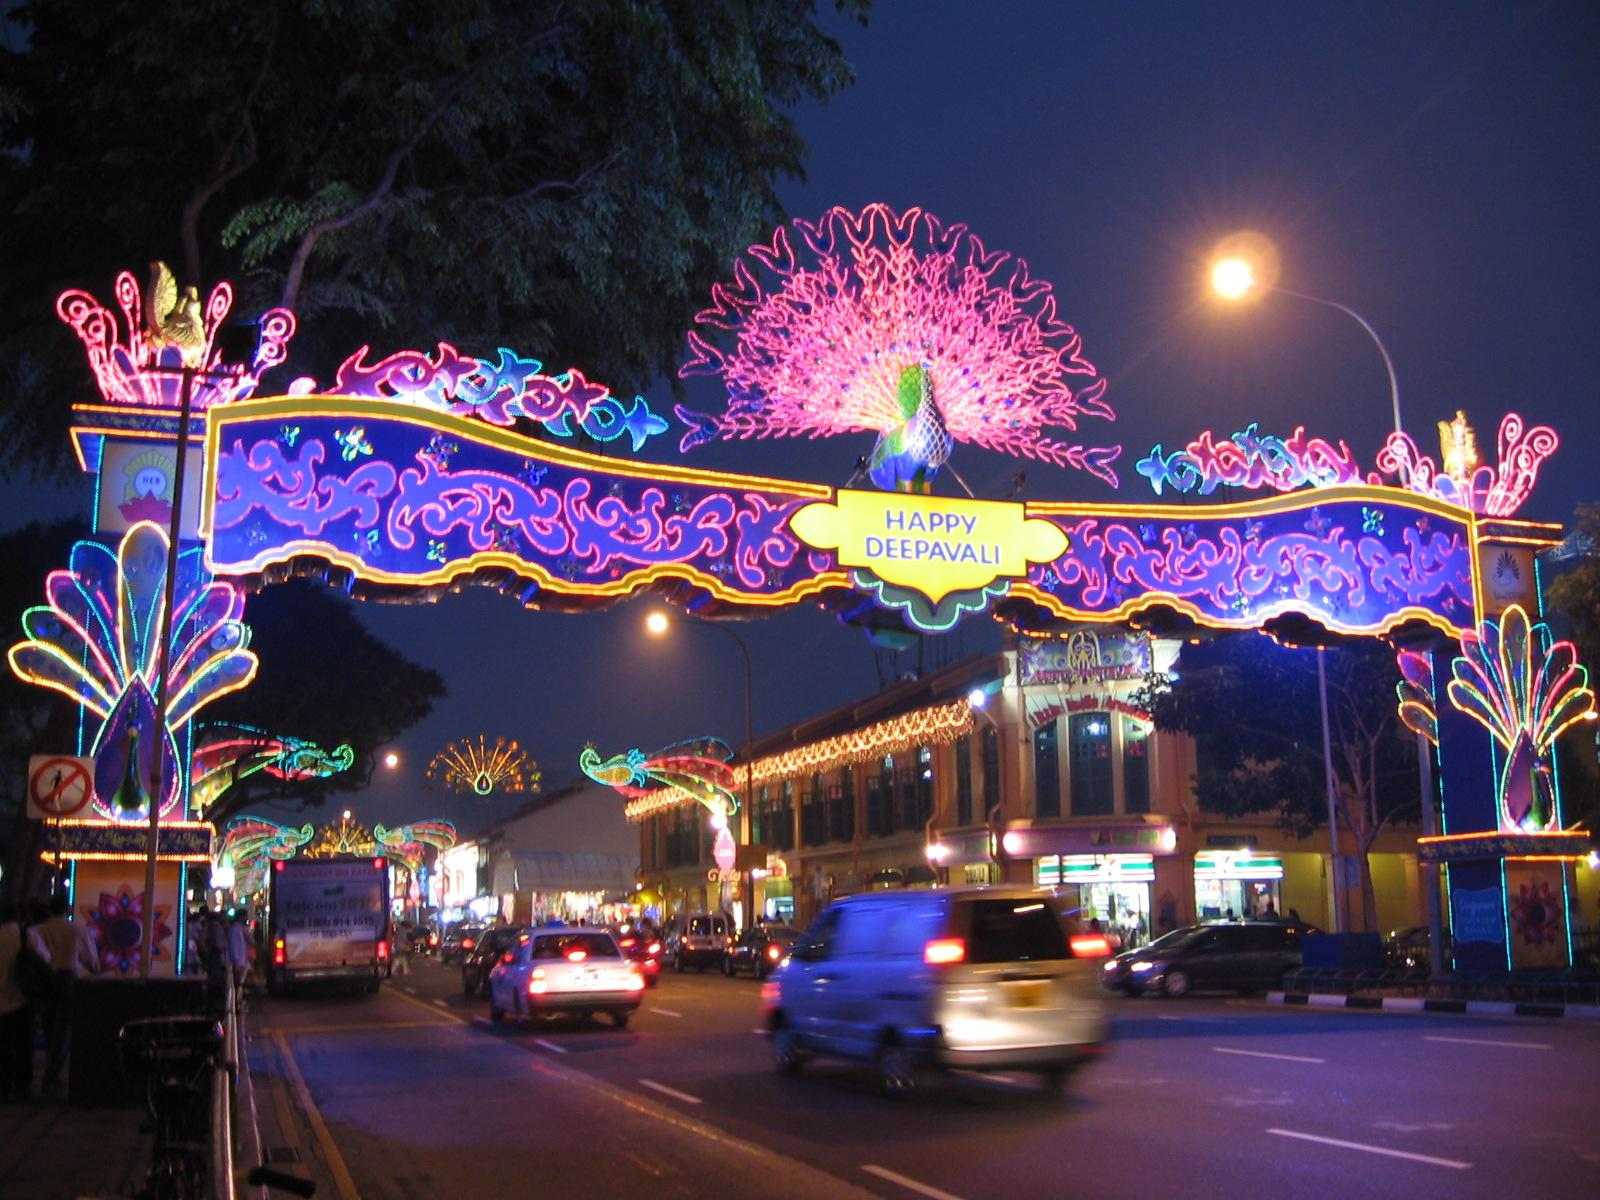 Deepavali, Little India, Singapore @ wikimedia commons